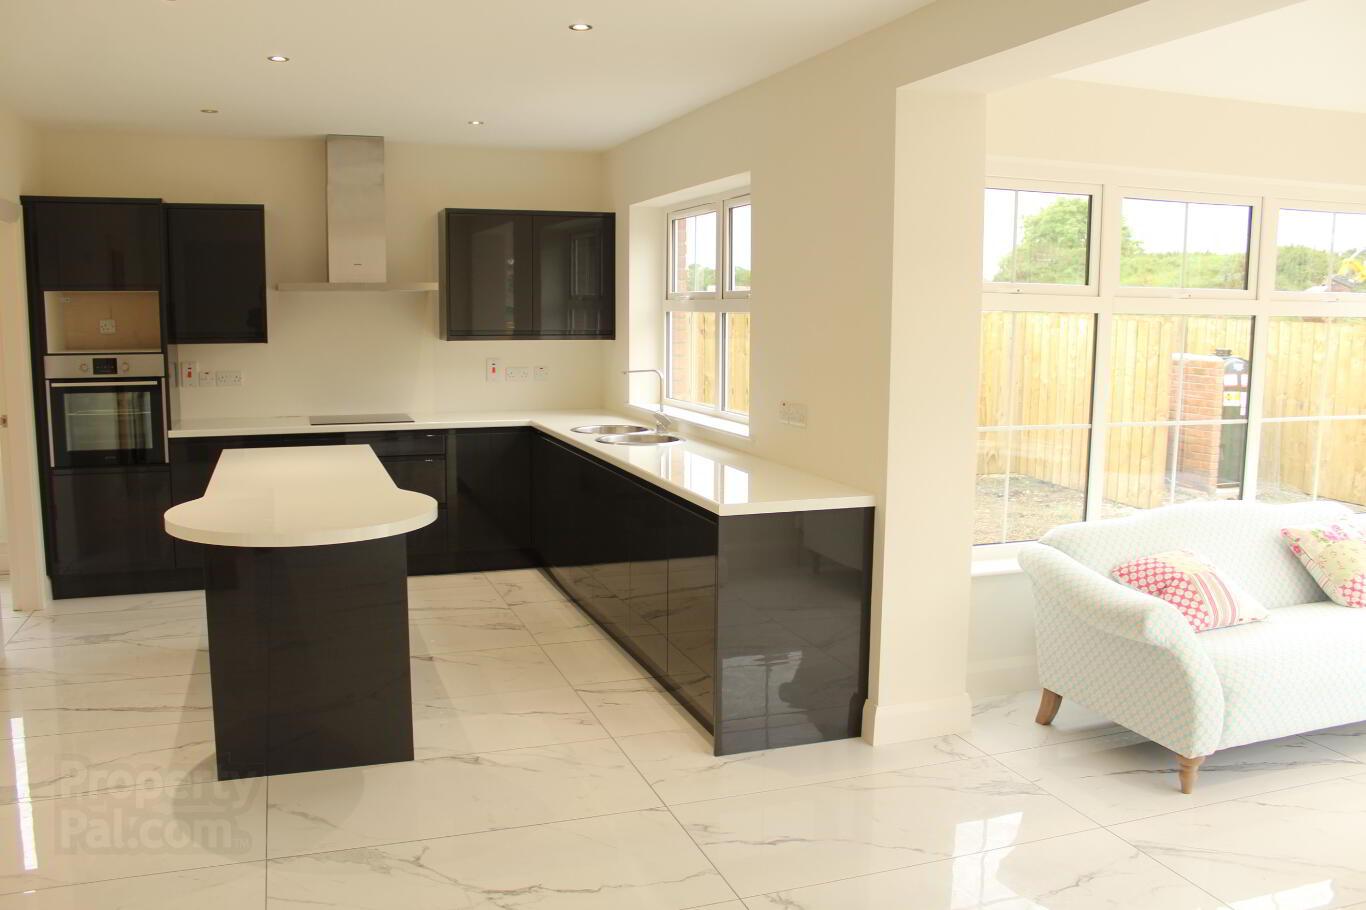 Forthaven Lane, Ballyrobert, Newtownabbey - PropertyPal